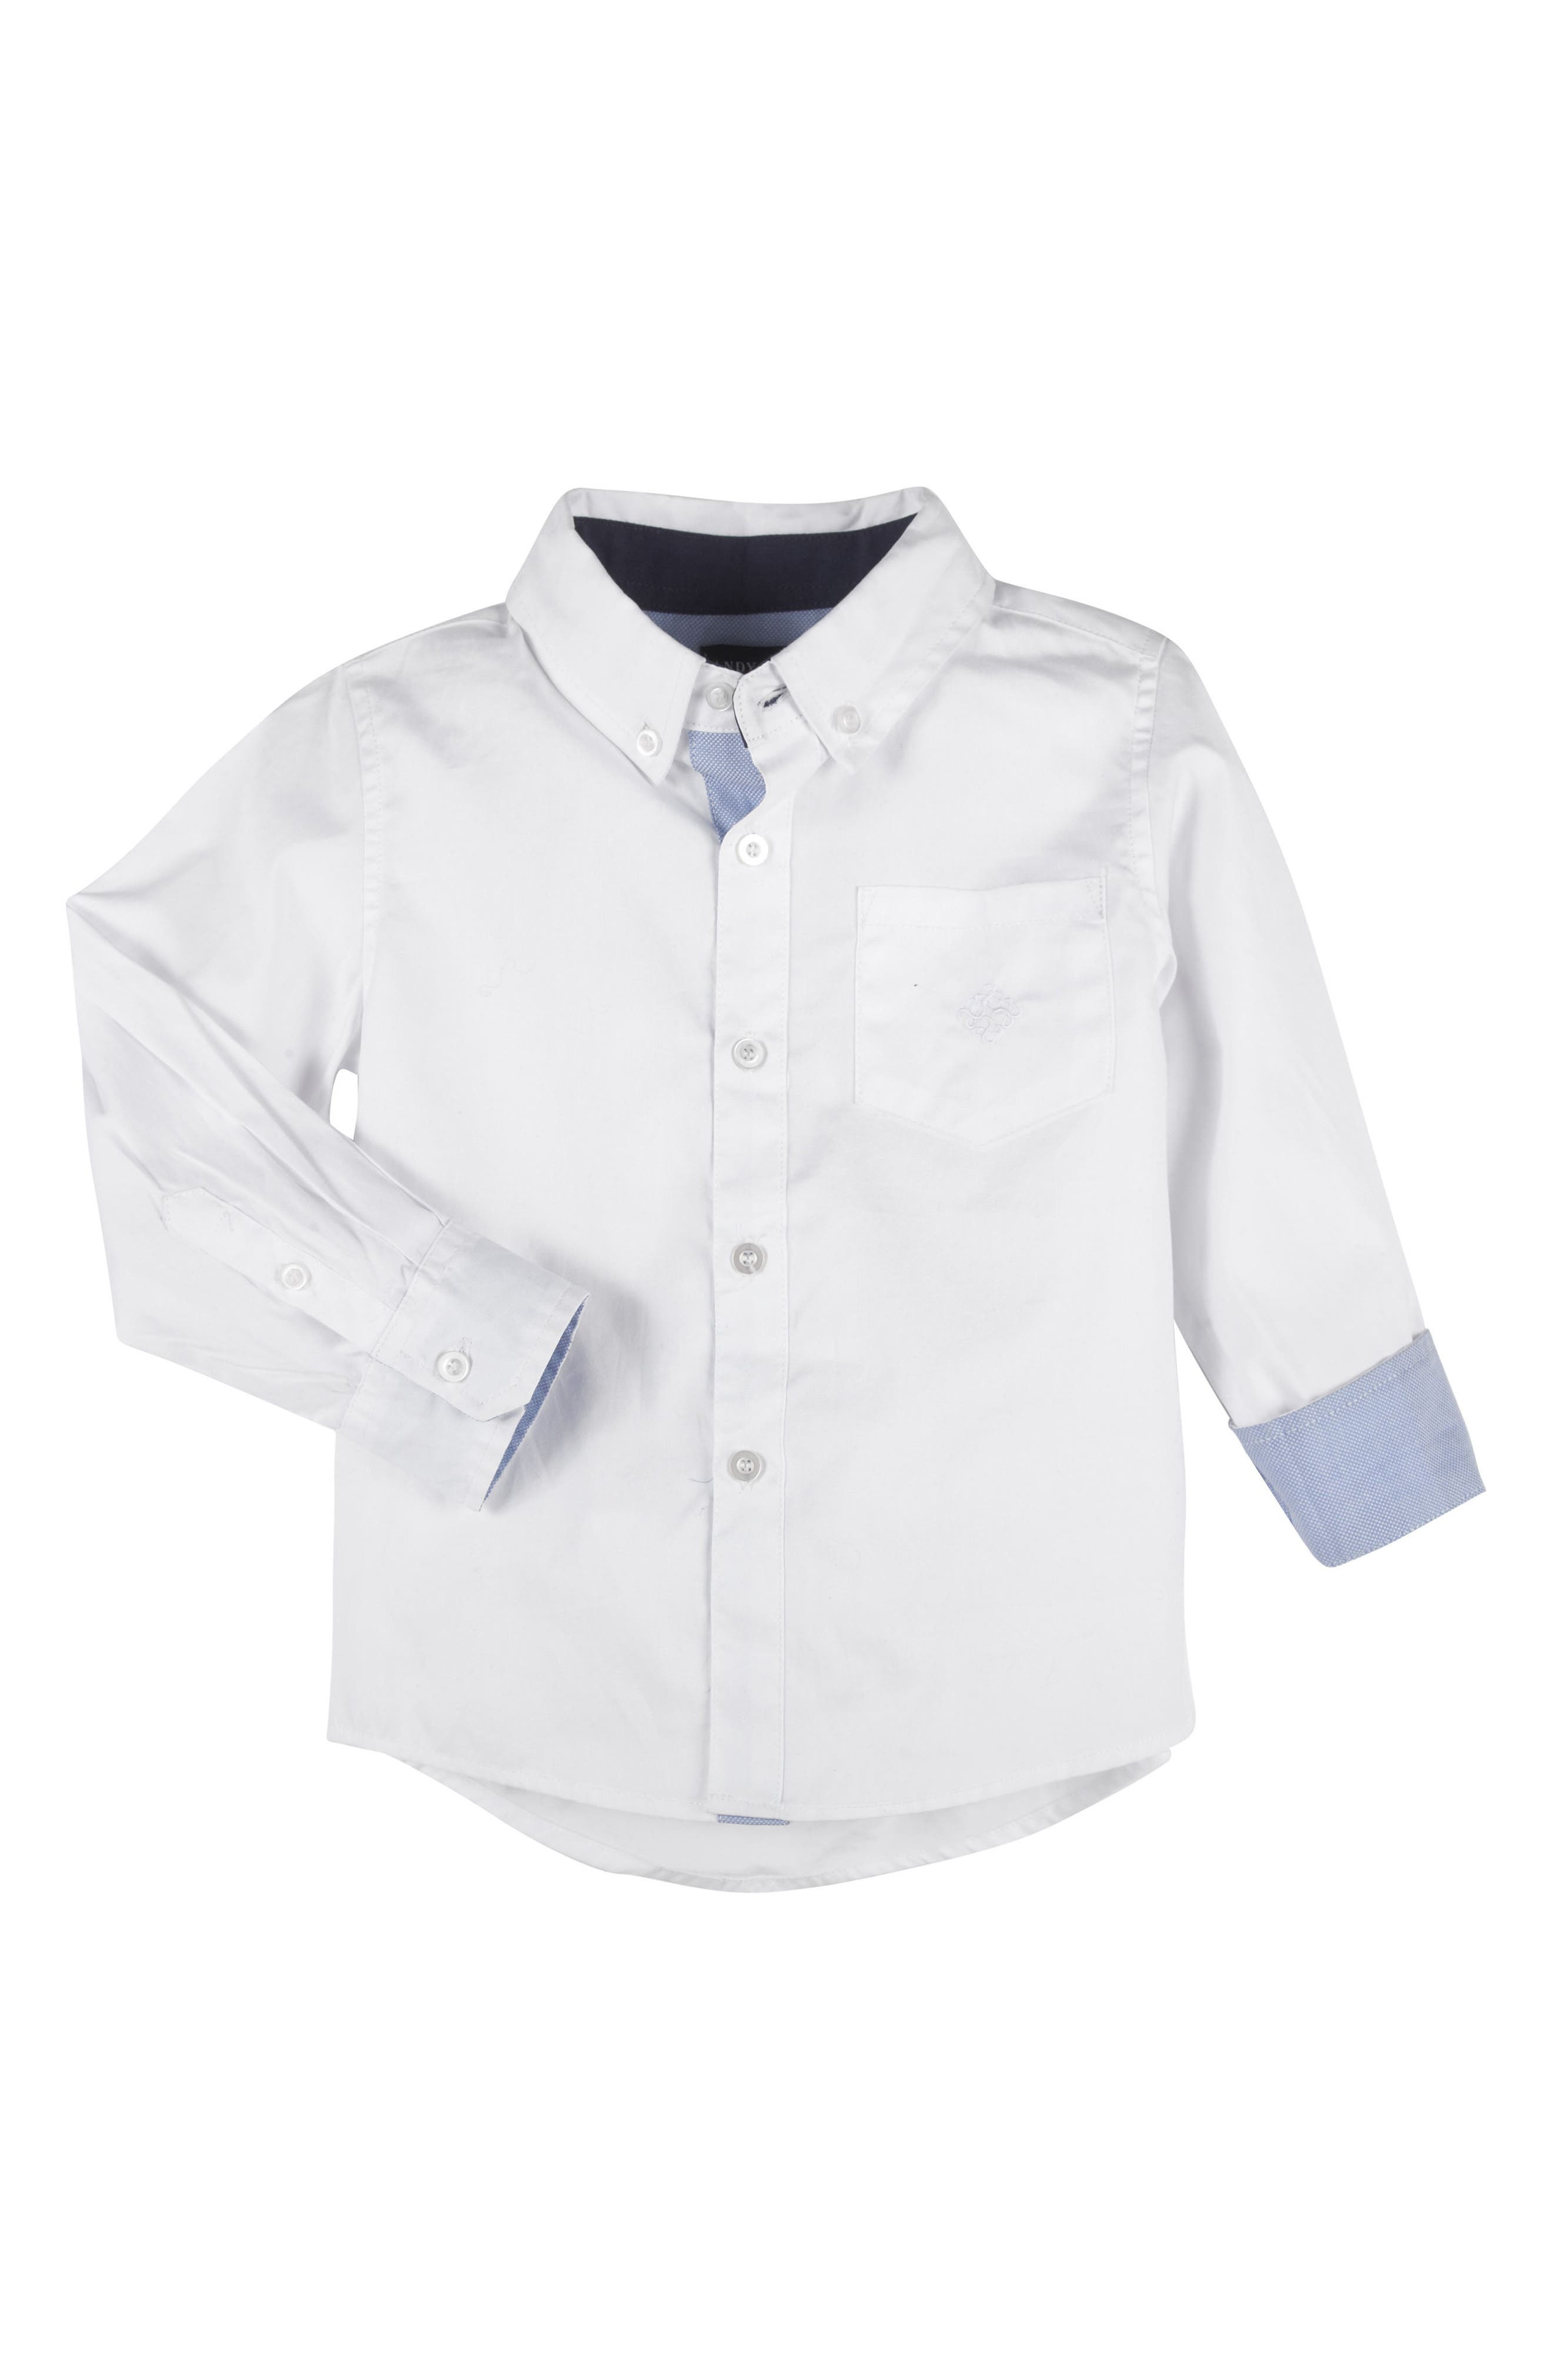 Alternate Image 1 Selected - Andy & Evan Oxford Shirt (Toddler Boys)